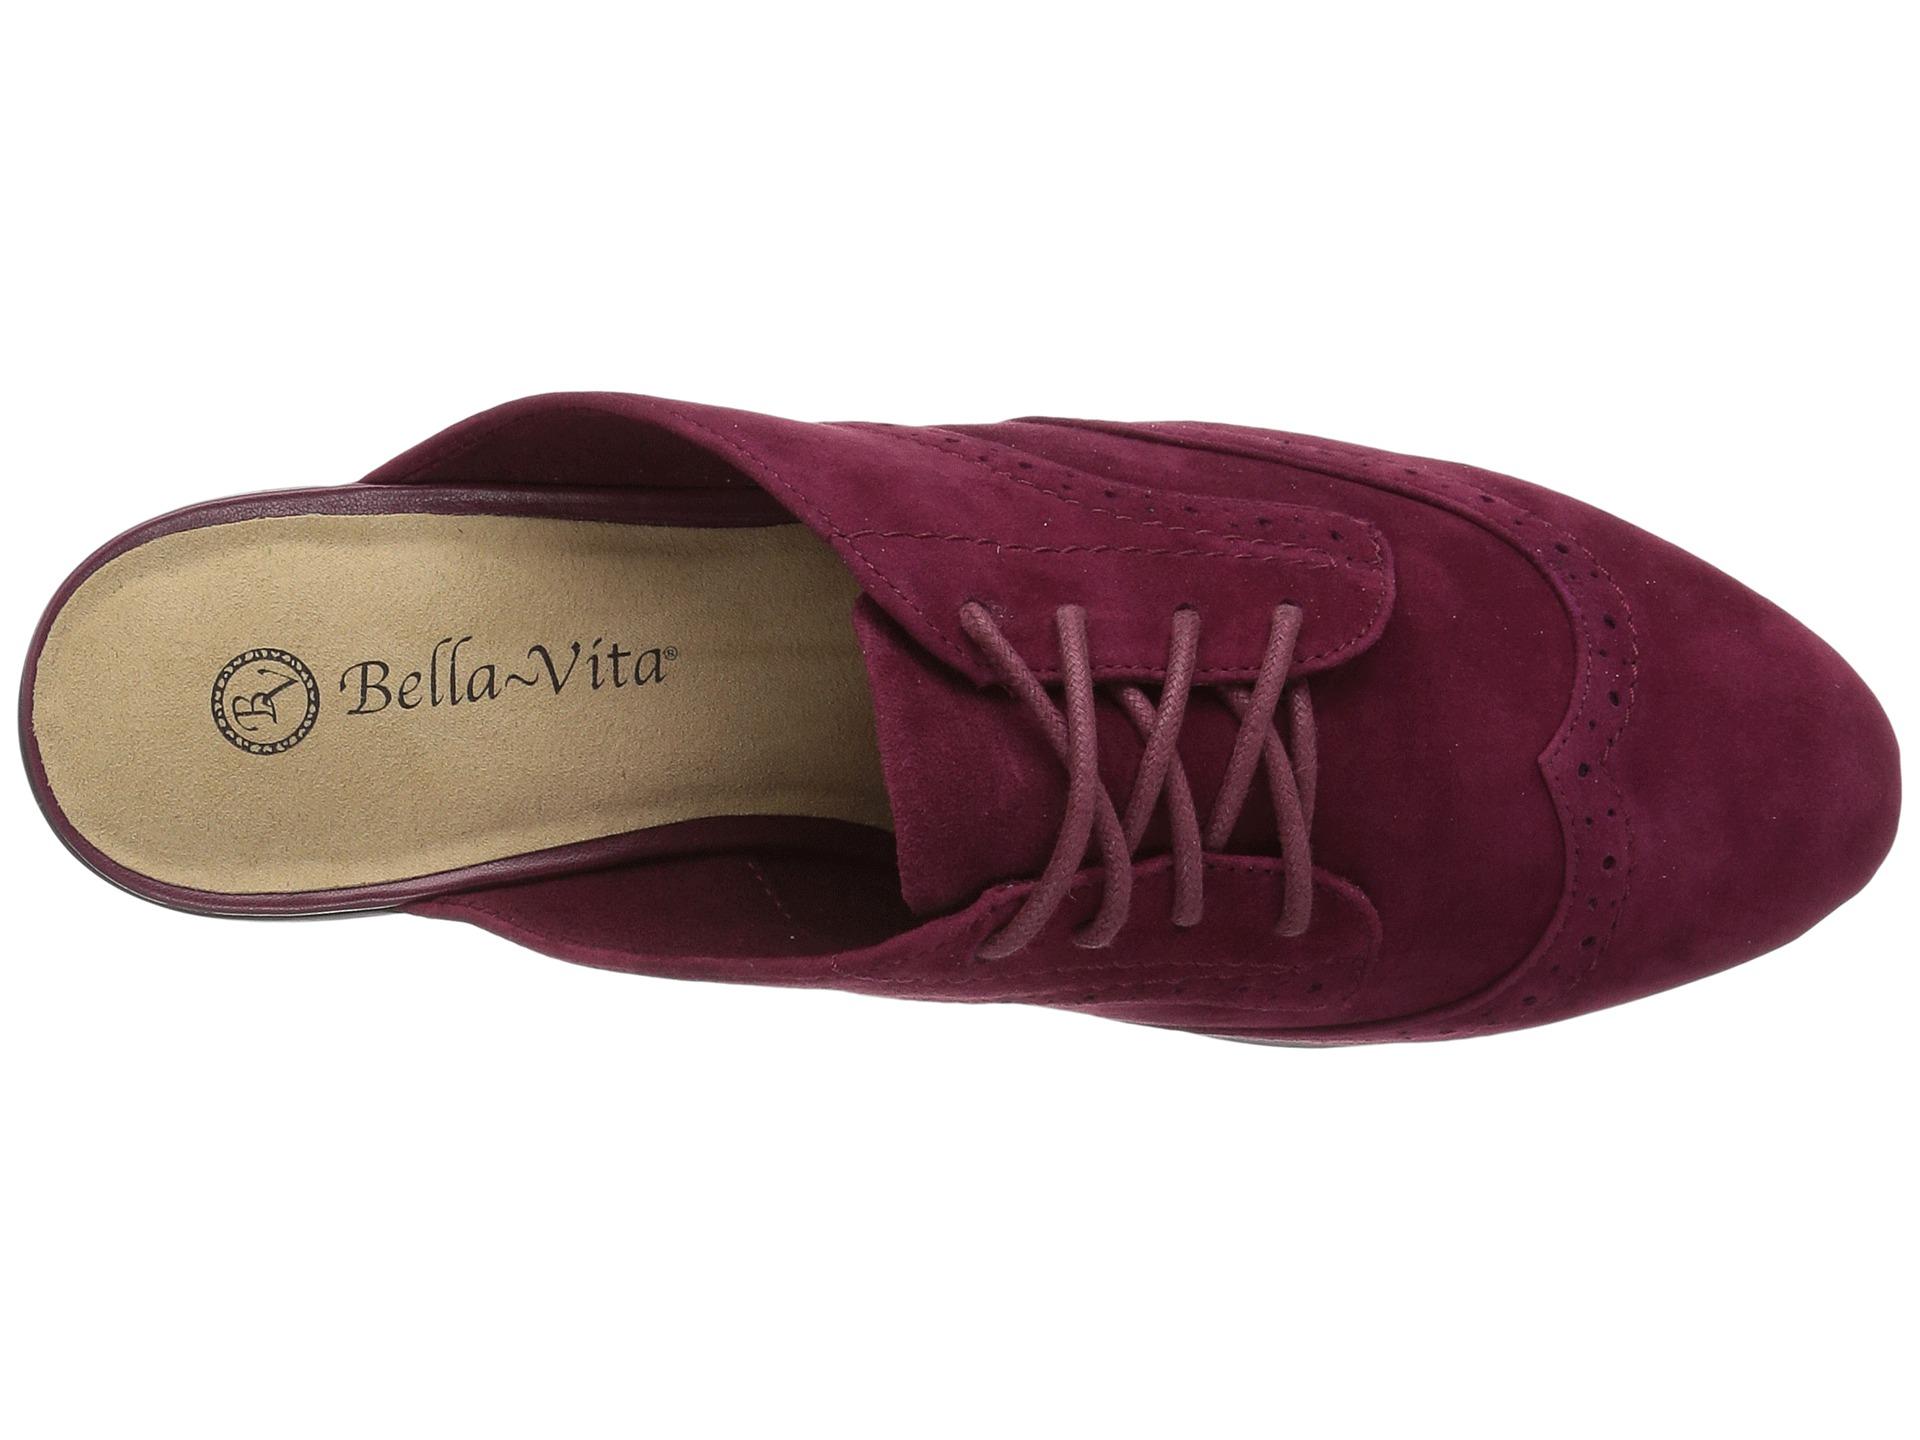 Bella vita baxter at for The bella vita